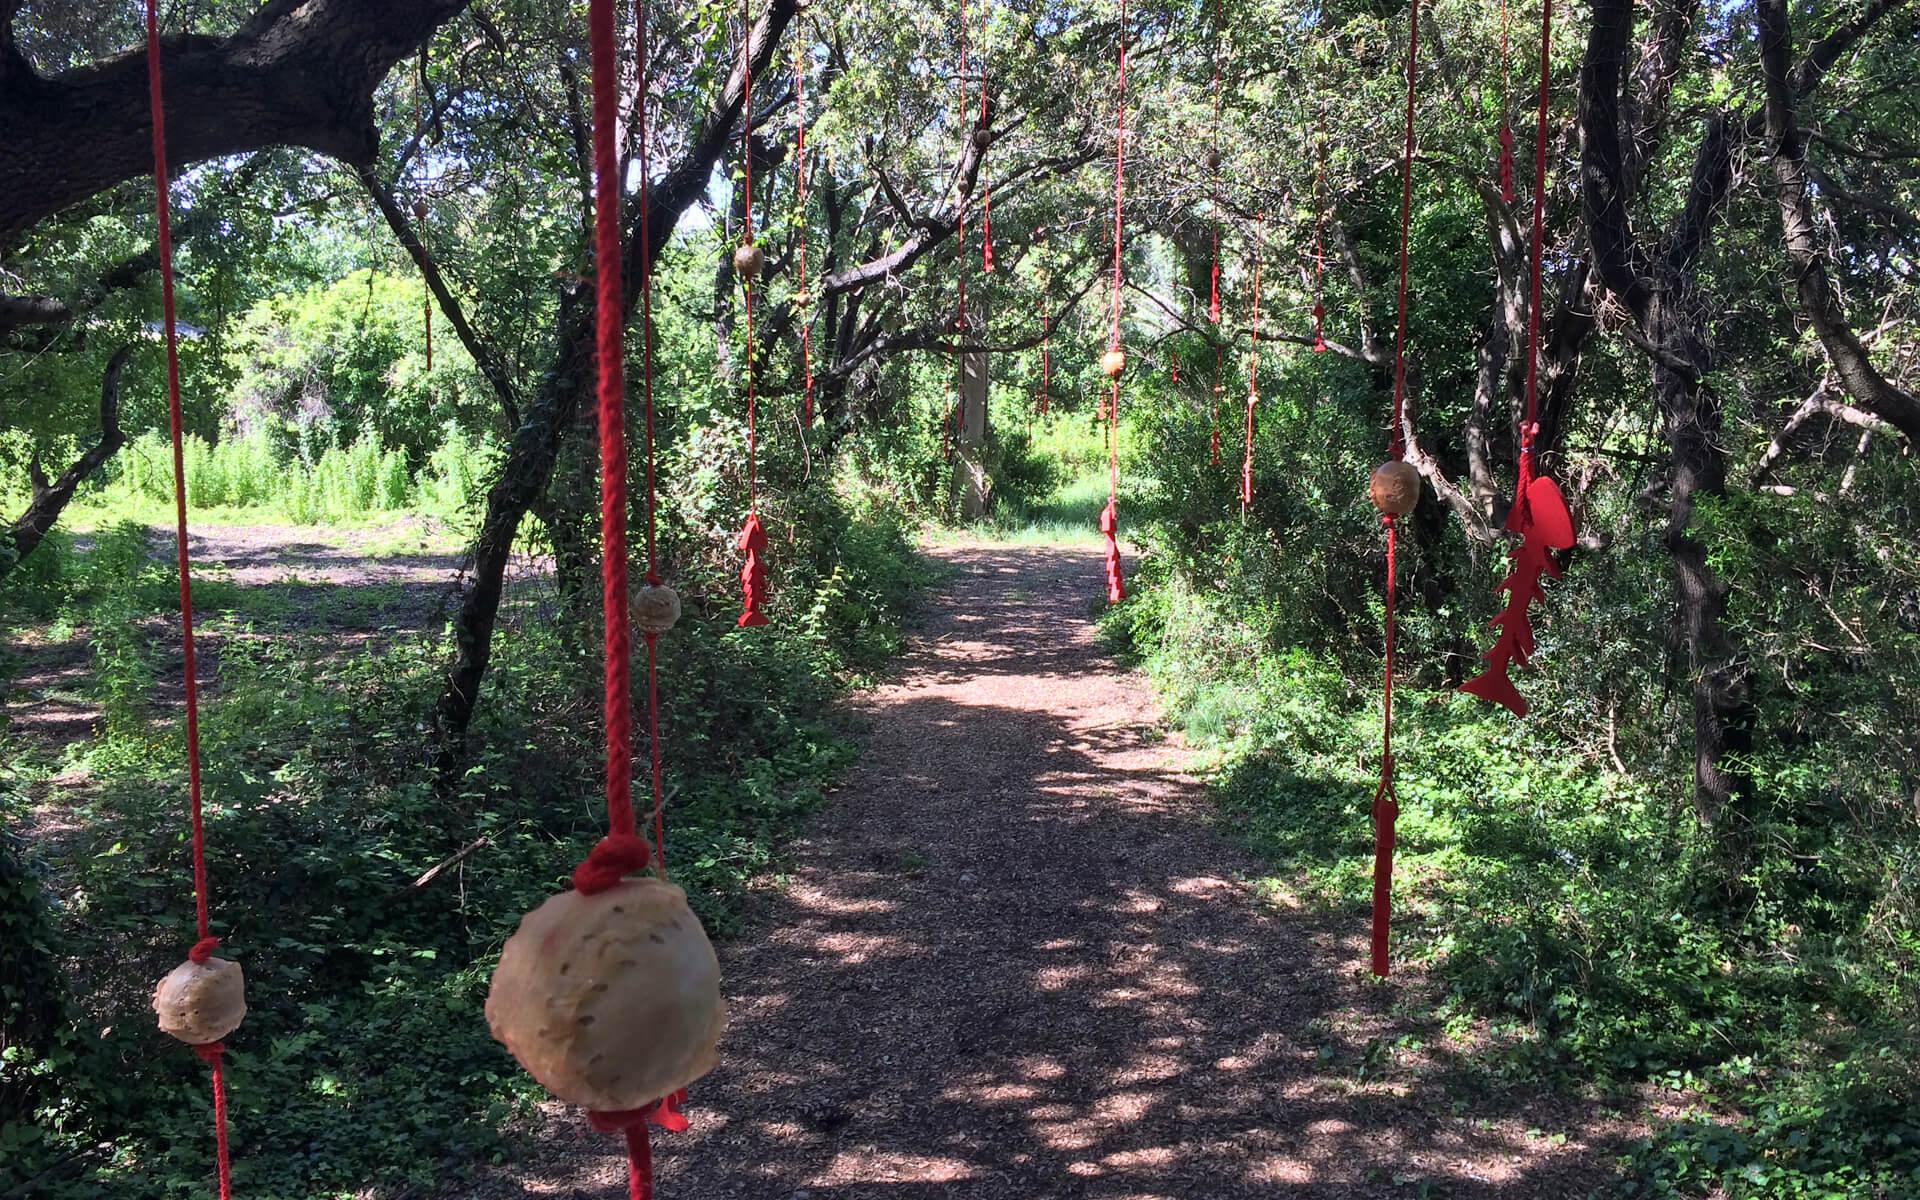 Apelle   Land Art Installation by Burningmax   XIV Land Art Campi Flegrei